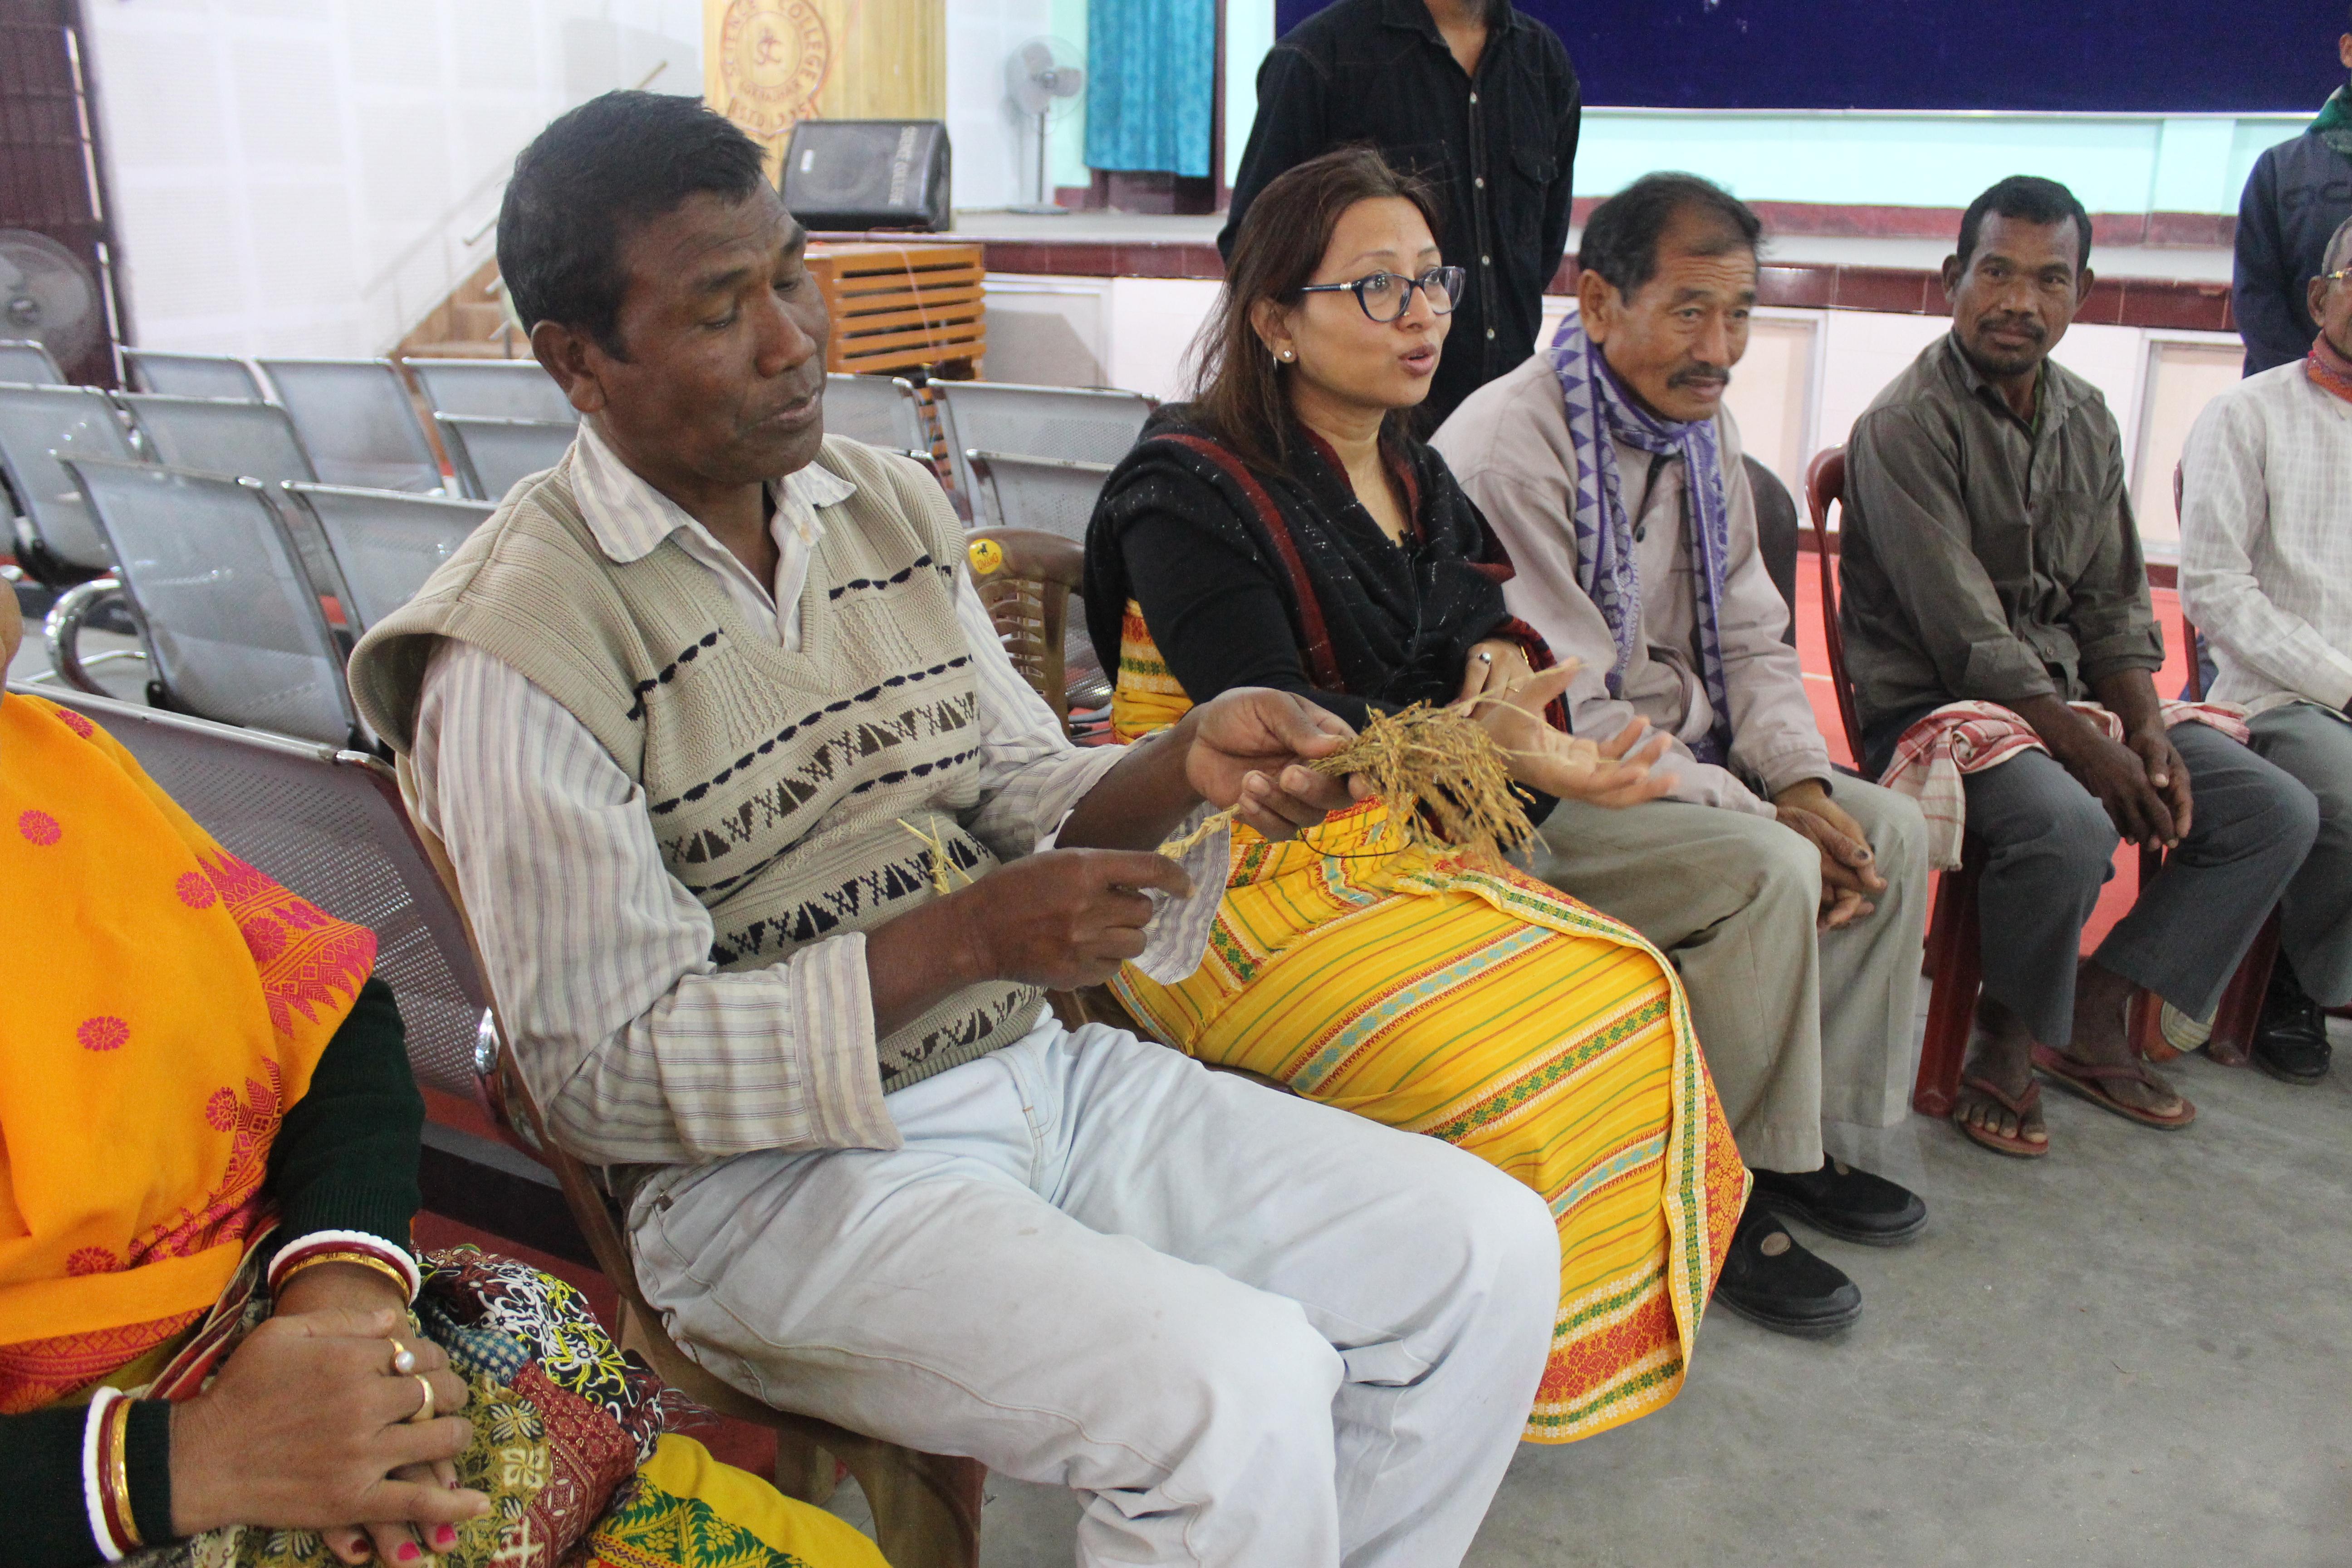 Rice, Community, Dialogue